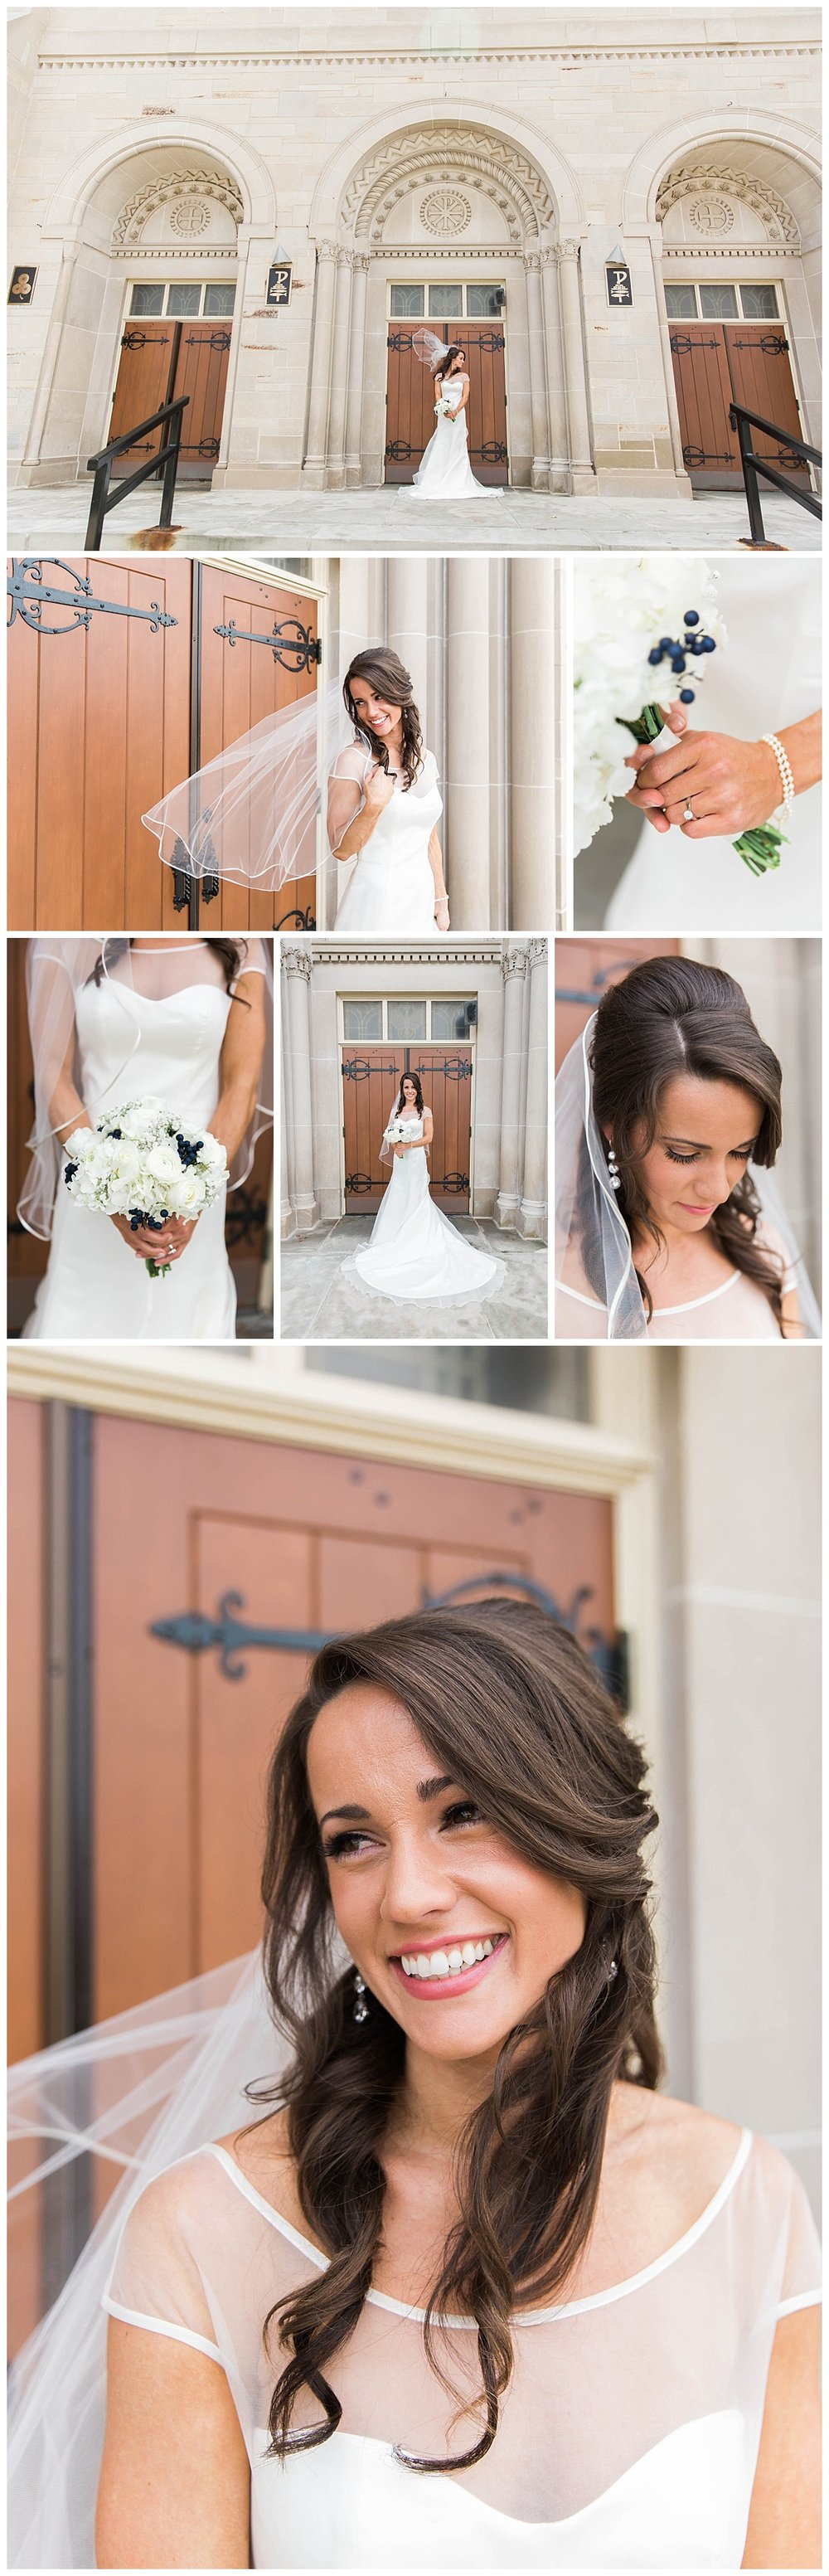 Cleveland-Wedding-Photographer_0102.jpg